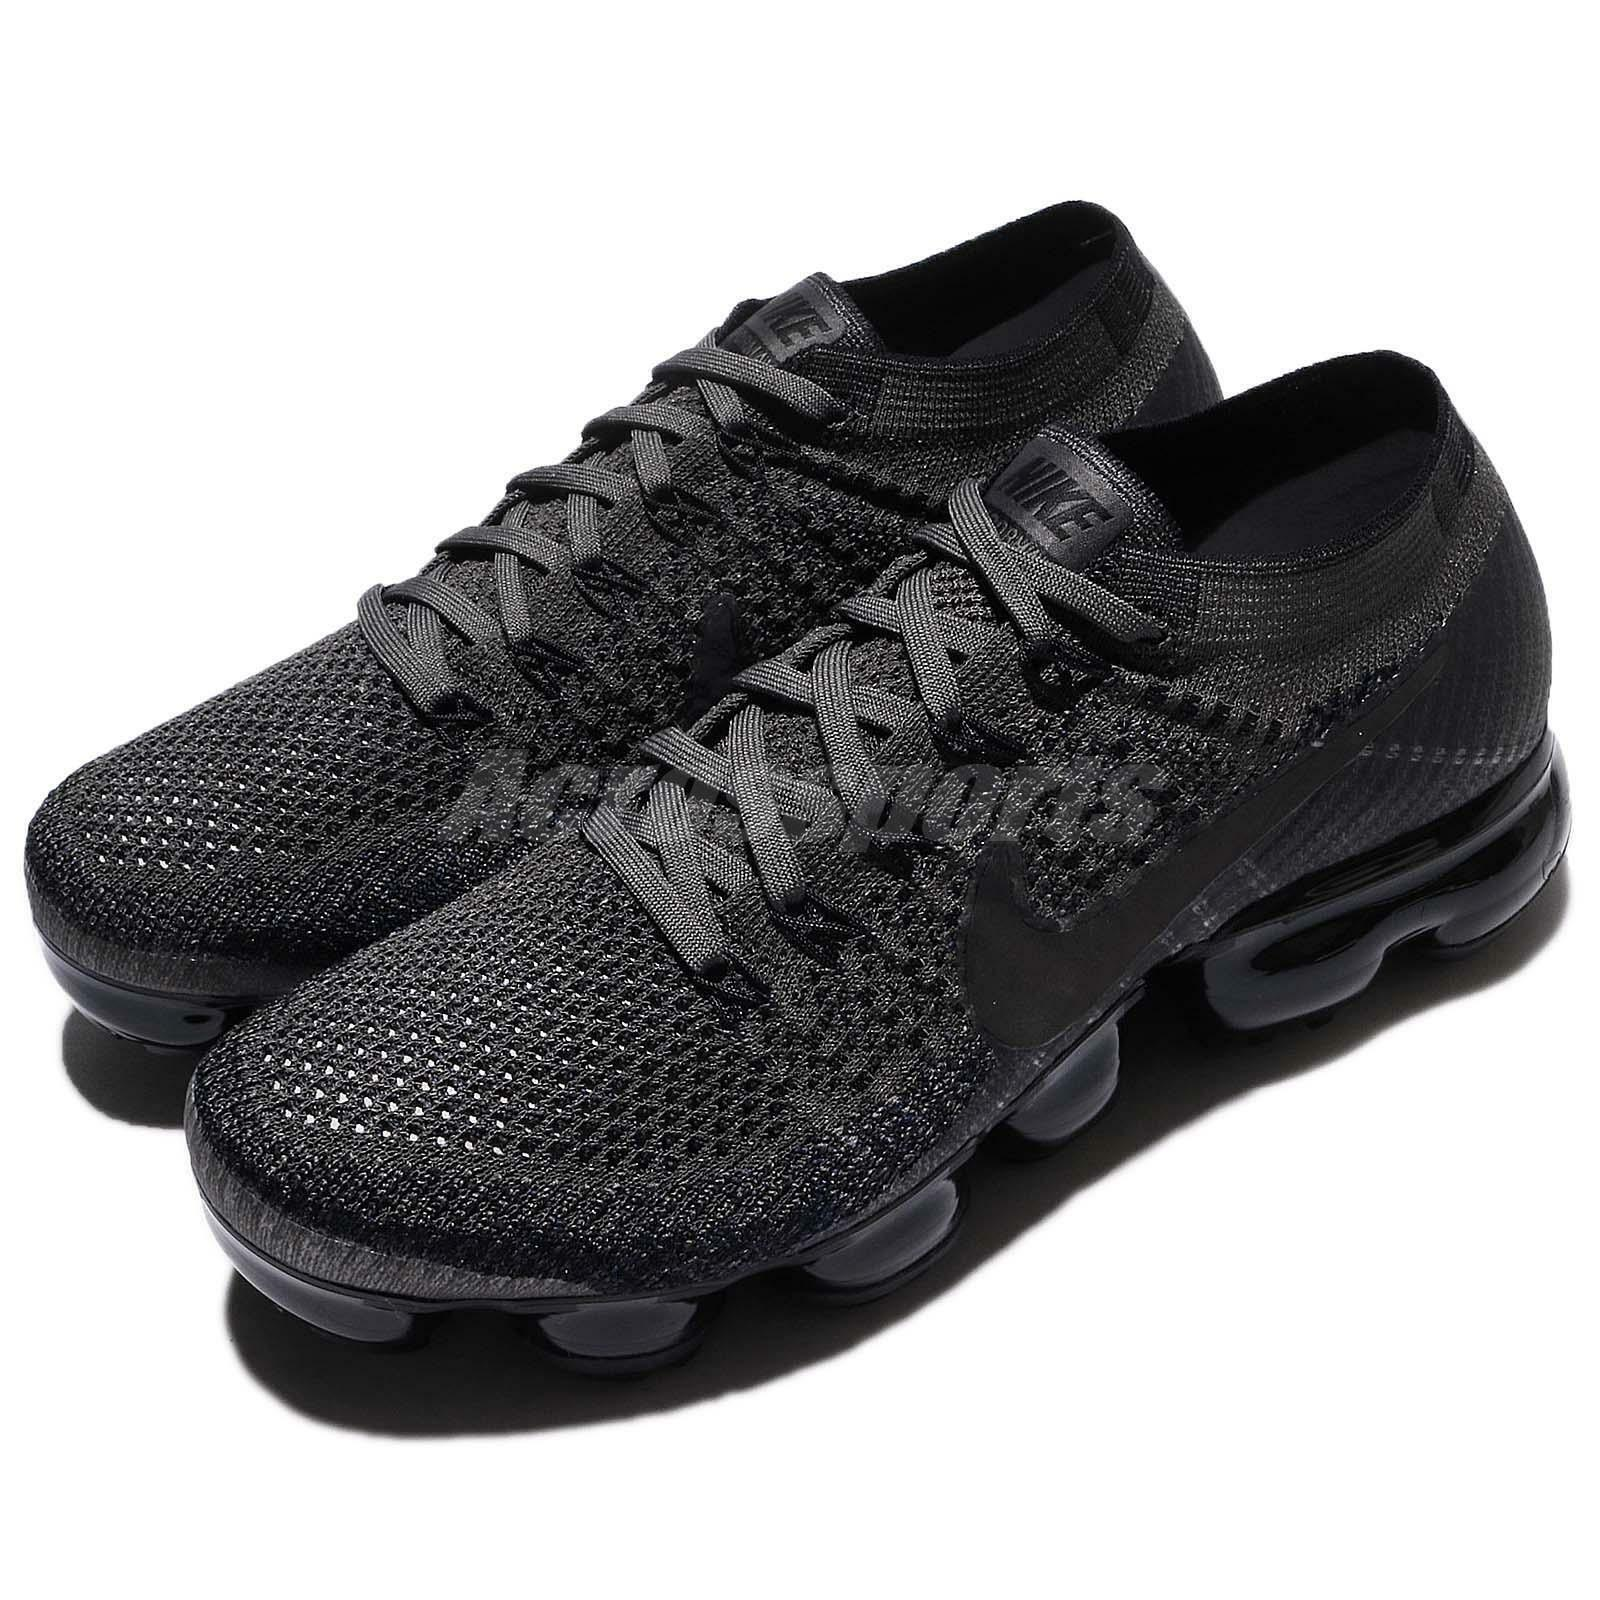 New Women's Nike Air Vapormax Flyknit Midnight Fog Black size size size 9.5 849557 009 ef4c42